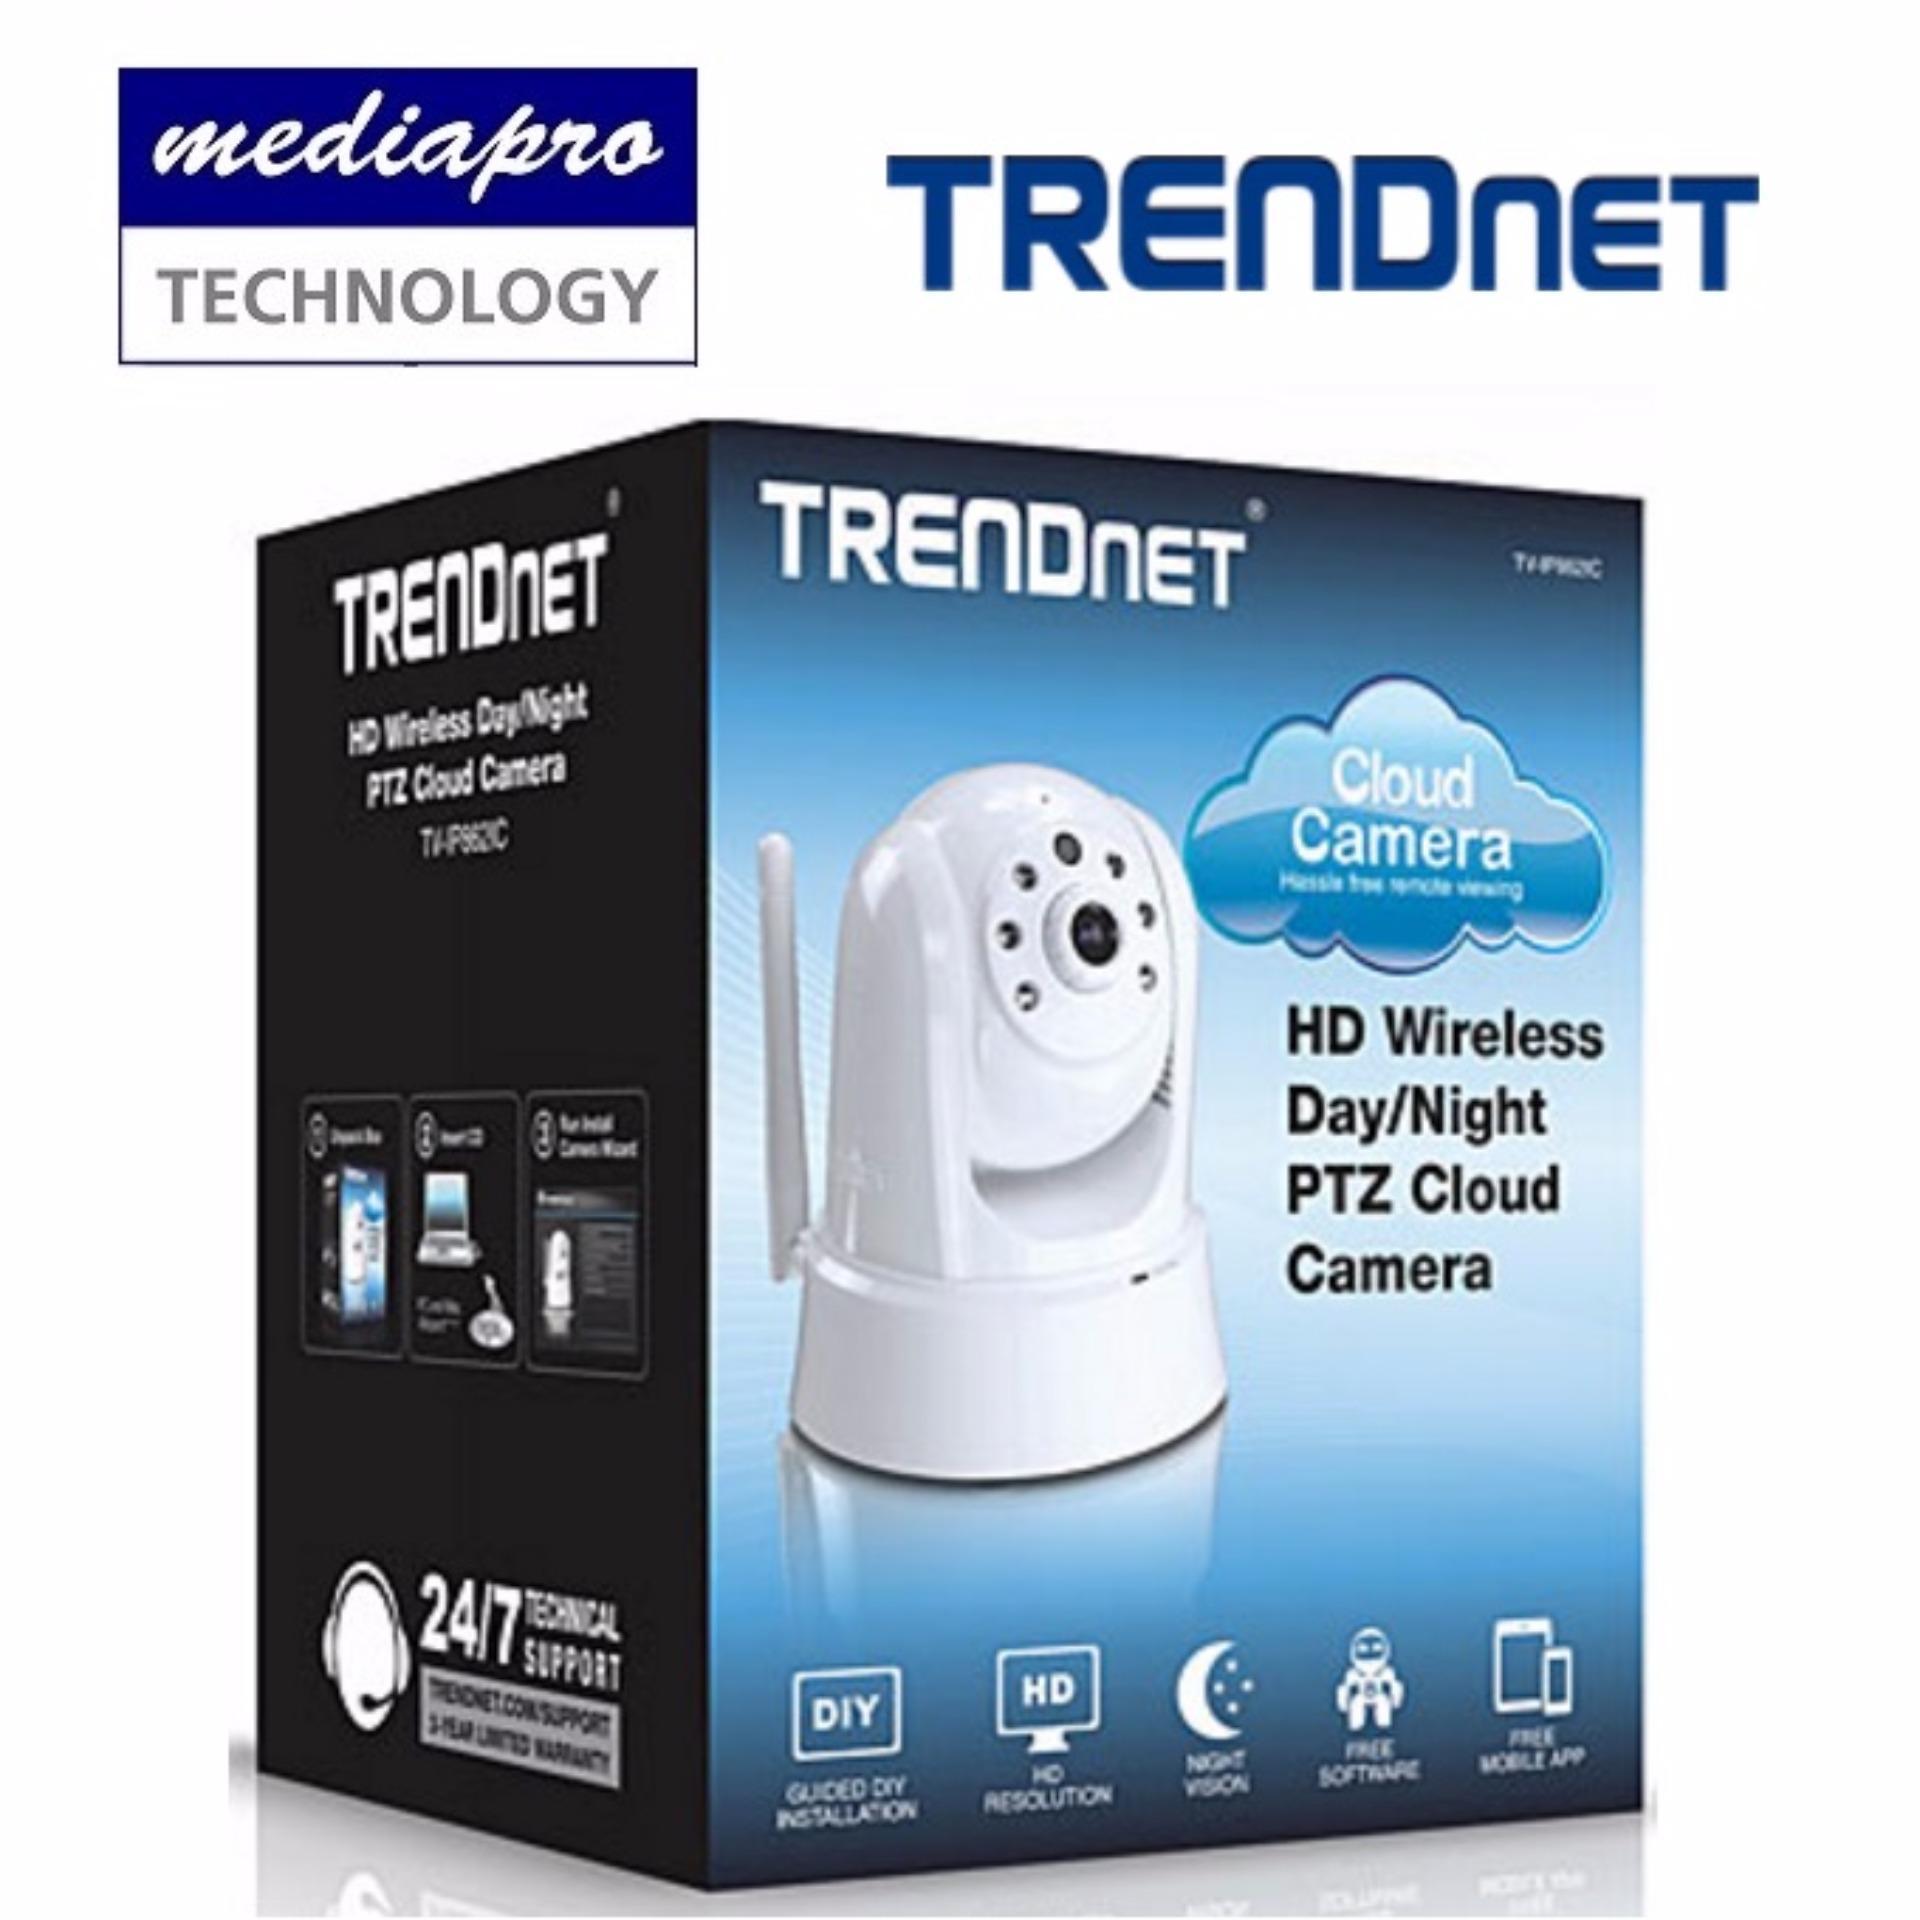 TRENDnet HD Wireless Day/Night PTZ Cloud Camera (TV-IP862IC )